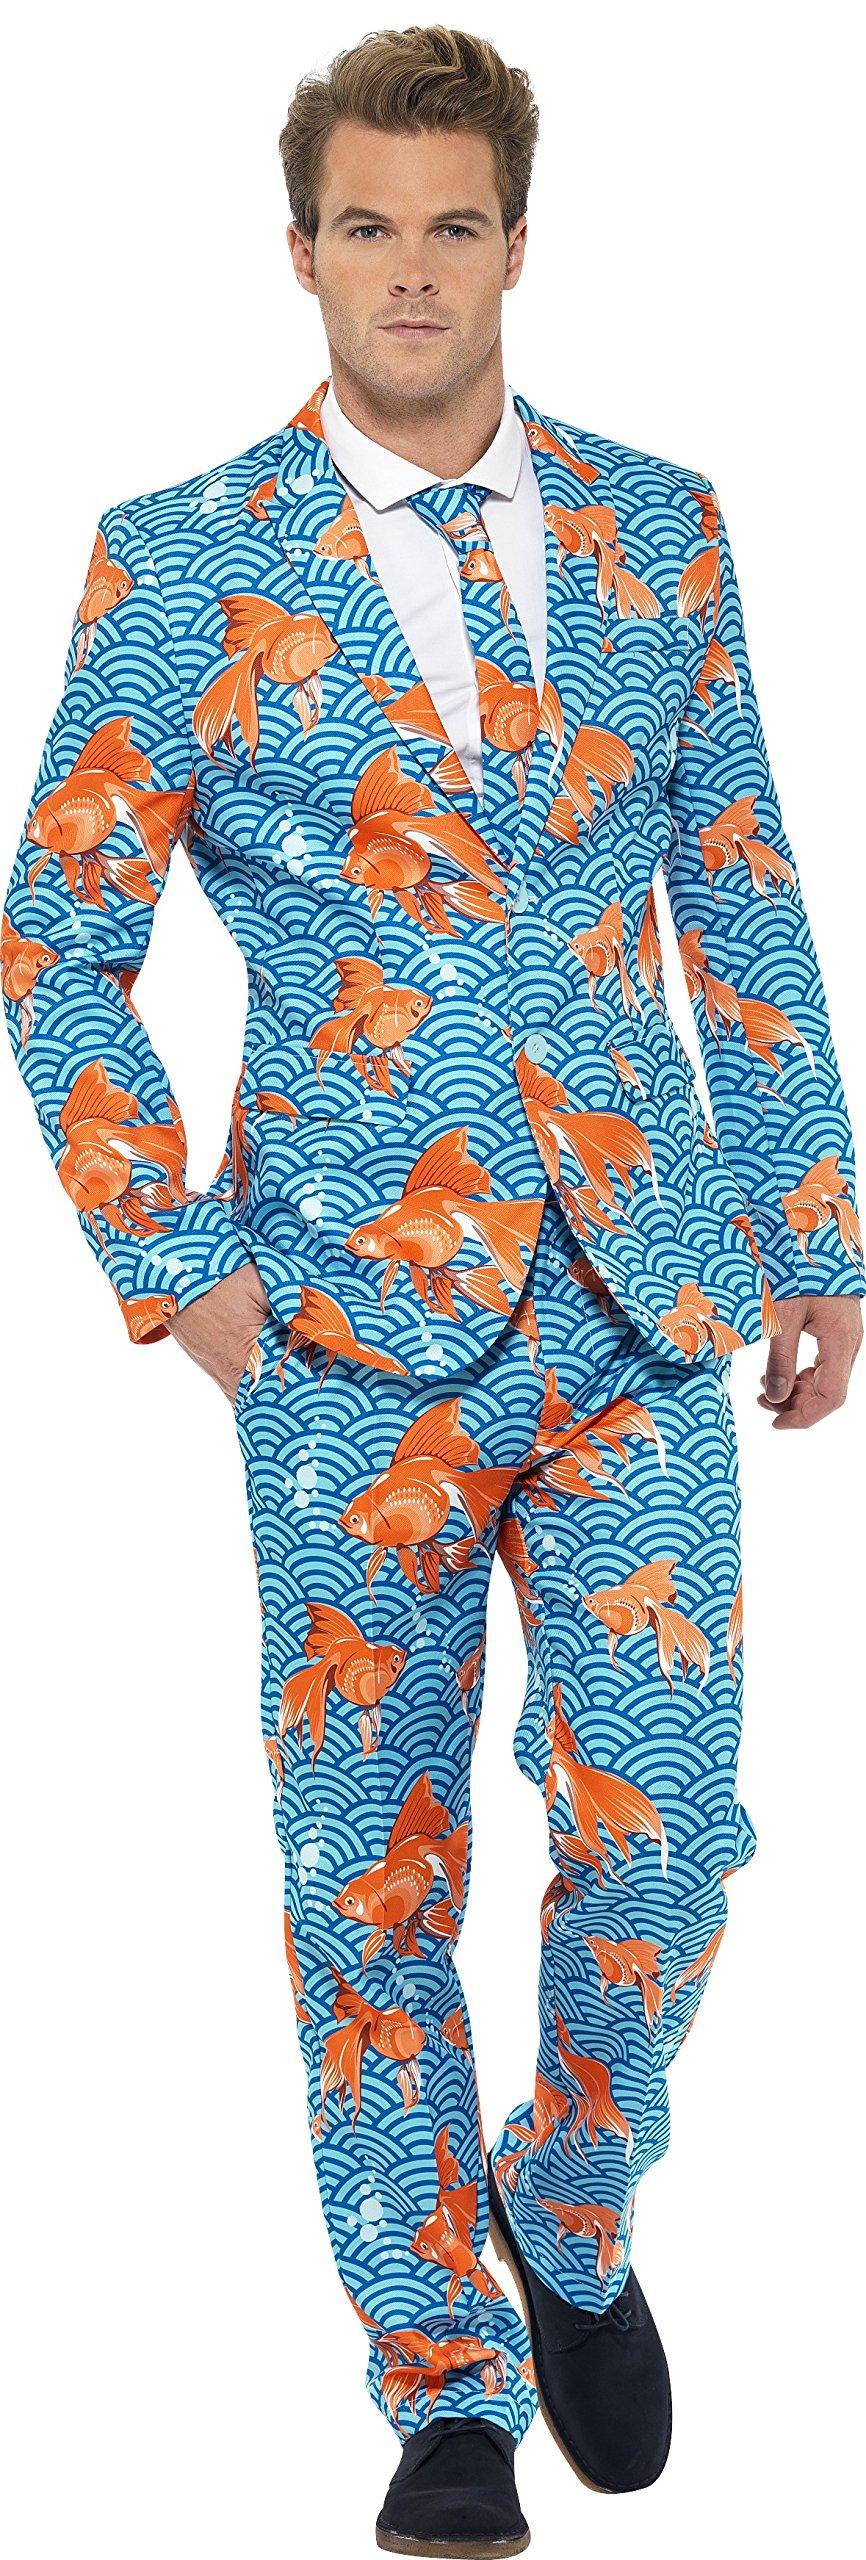 Funny Suits: Amazon.co.uk